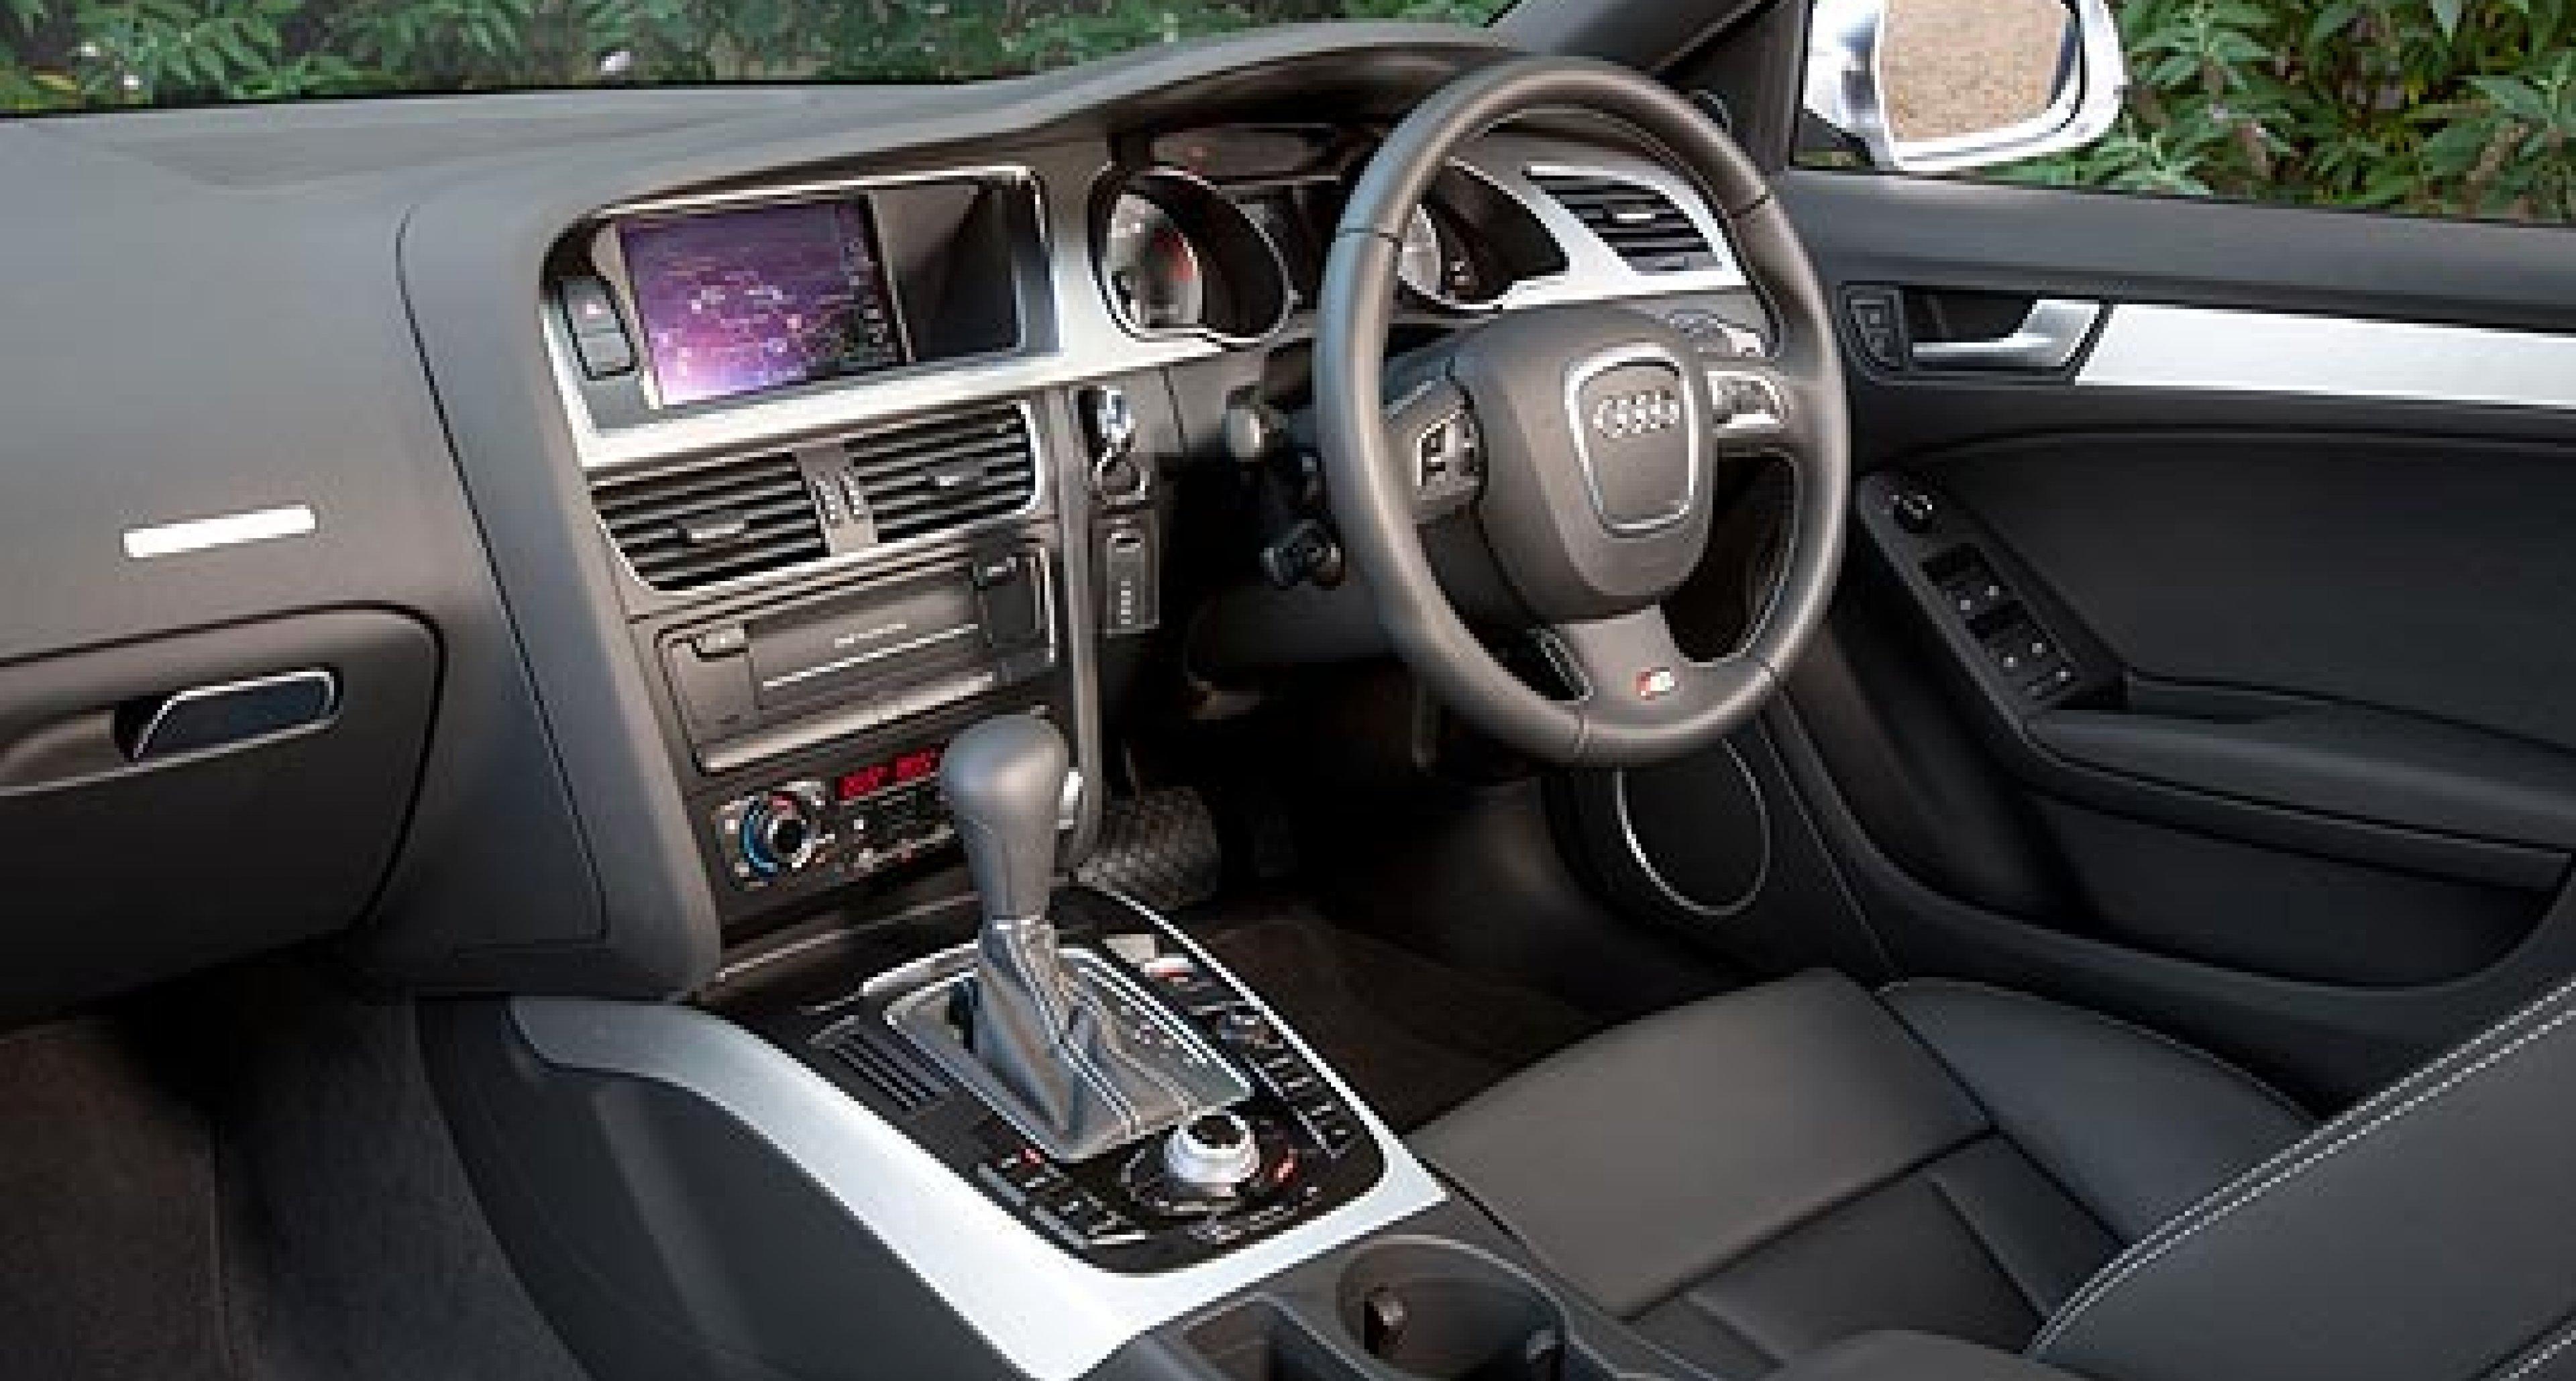 Audi S5 Sportback – Road Test by Tony Dron